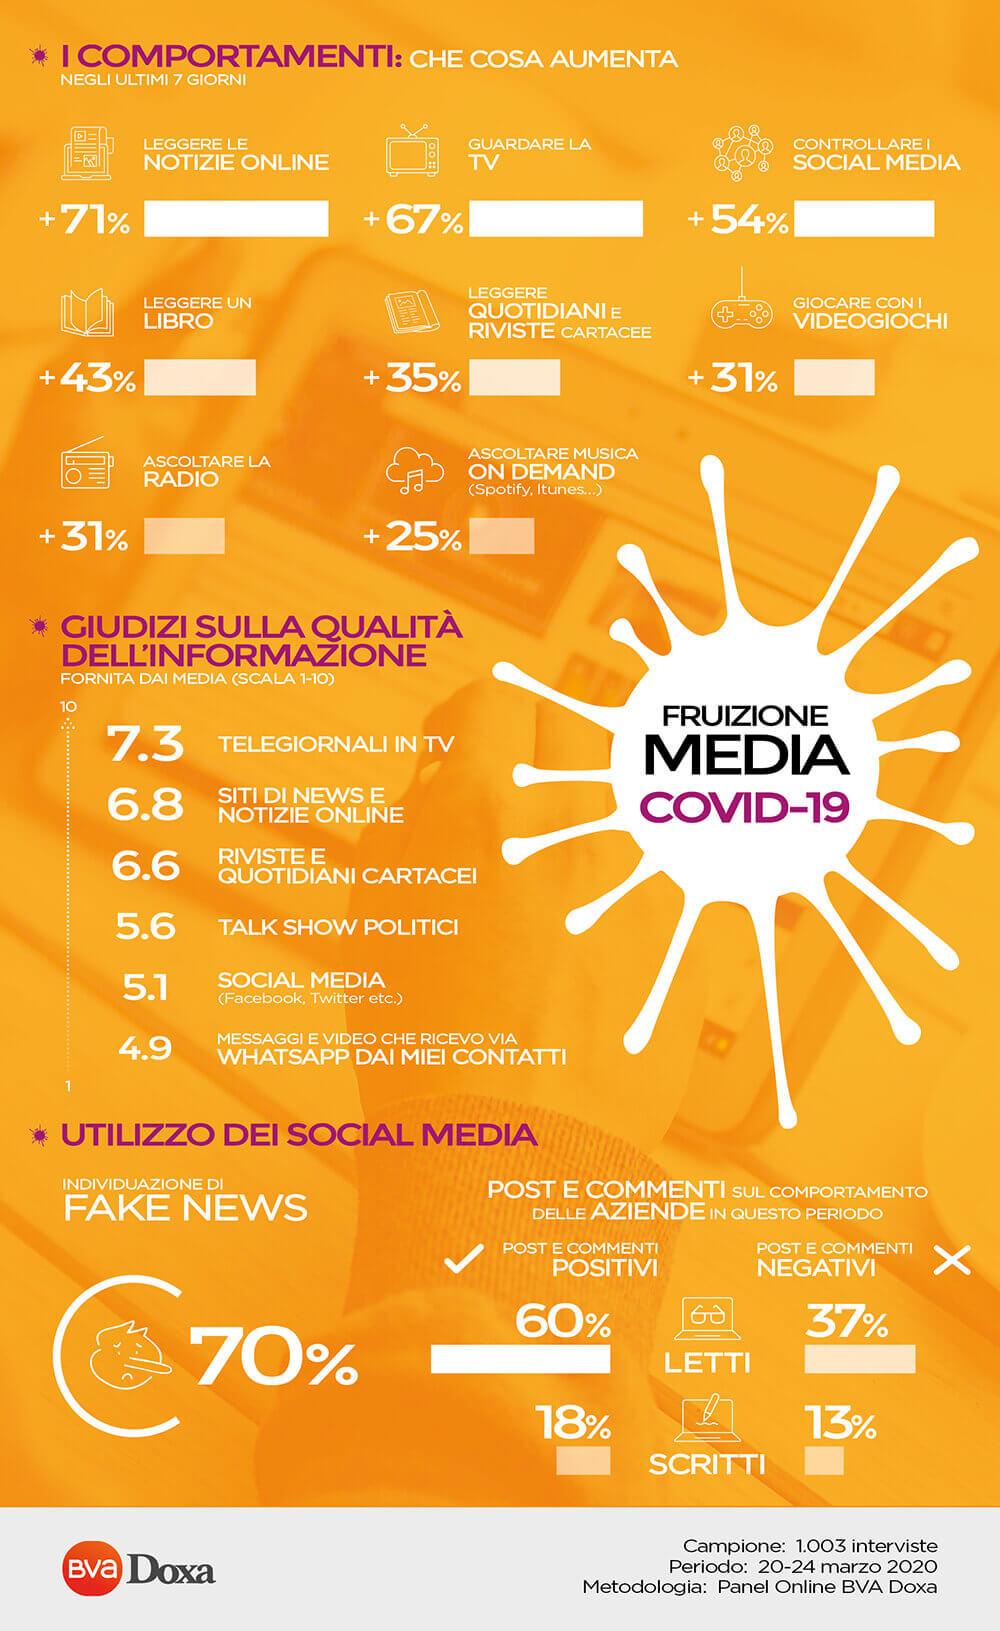 Covid-19 - consumer tracking - 1 wave - MEDIA